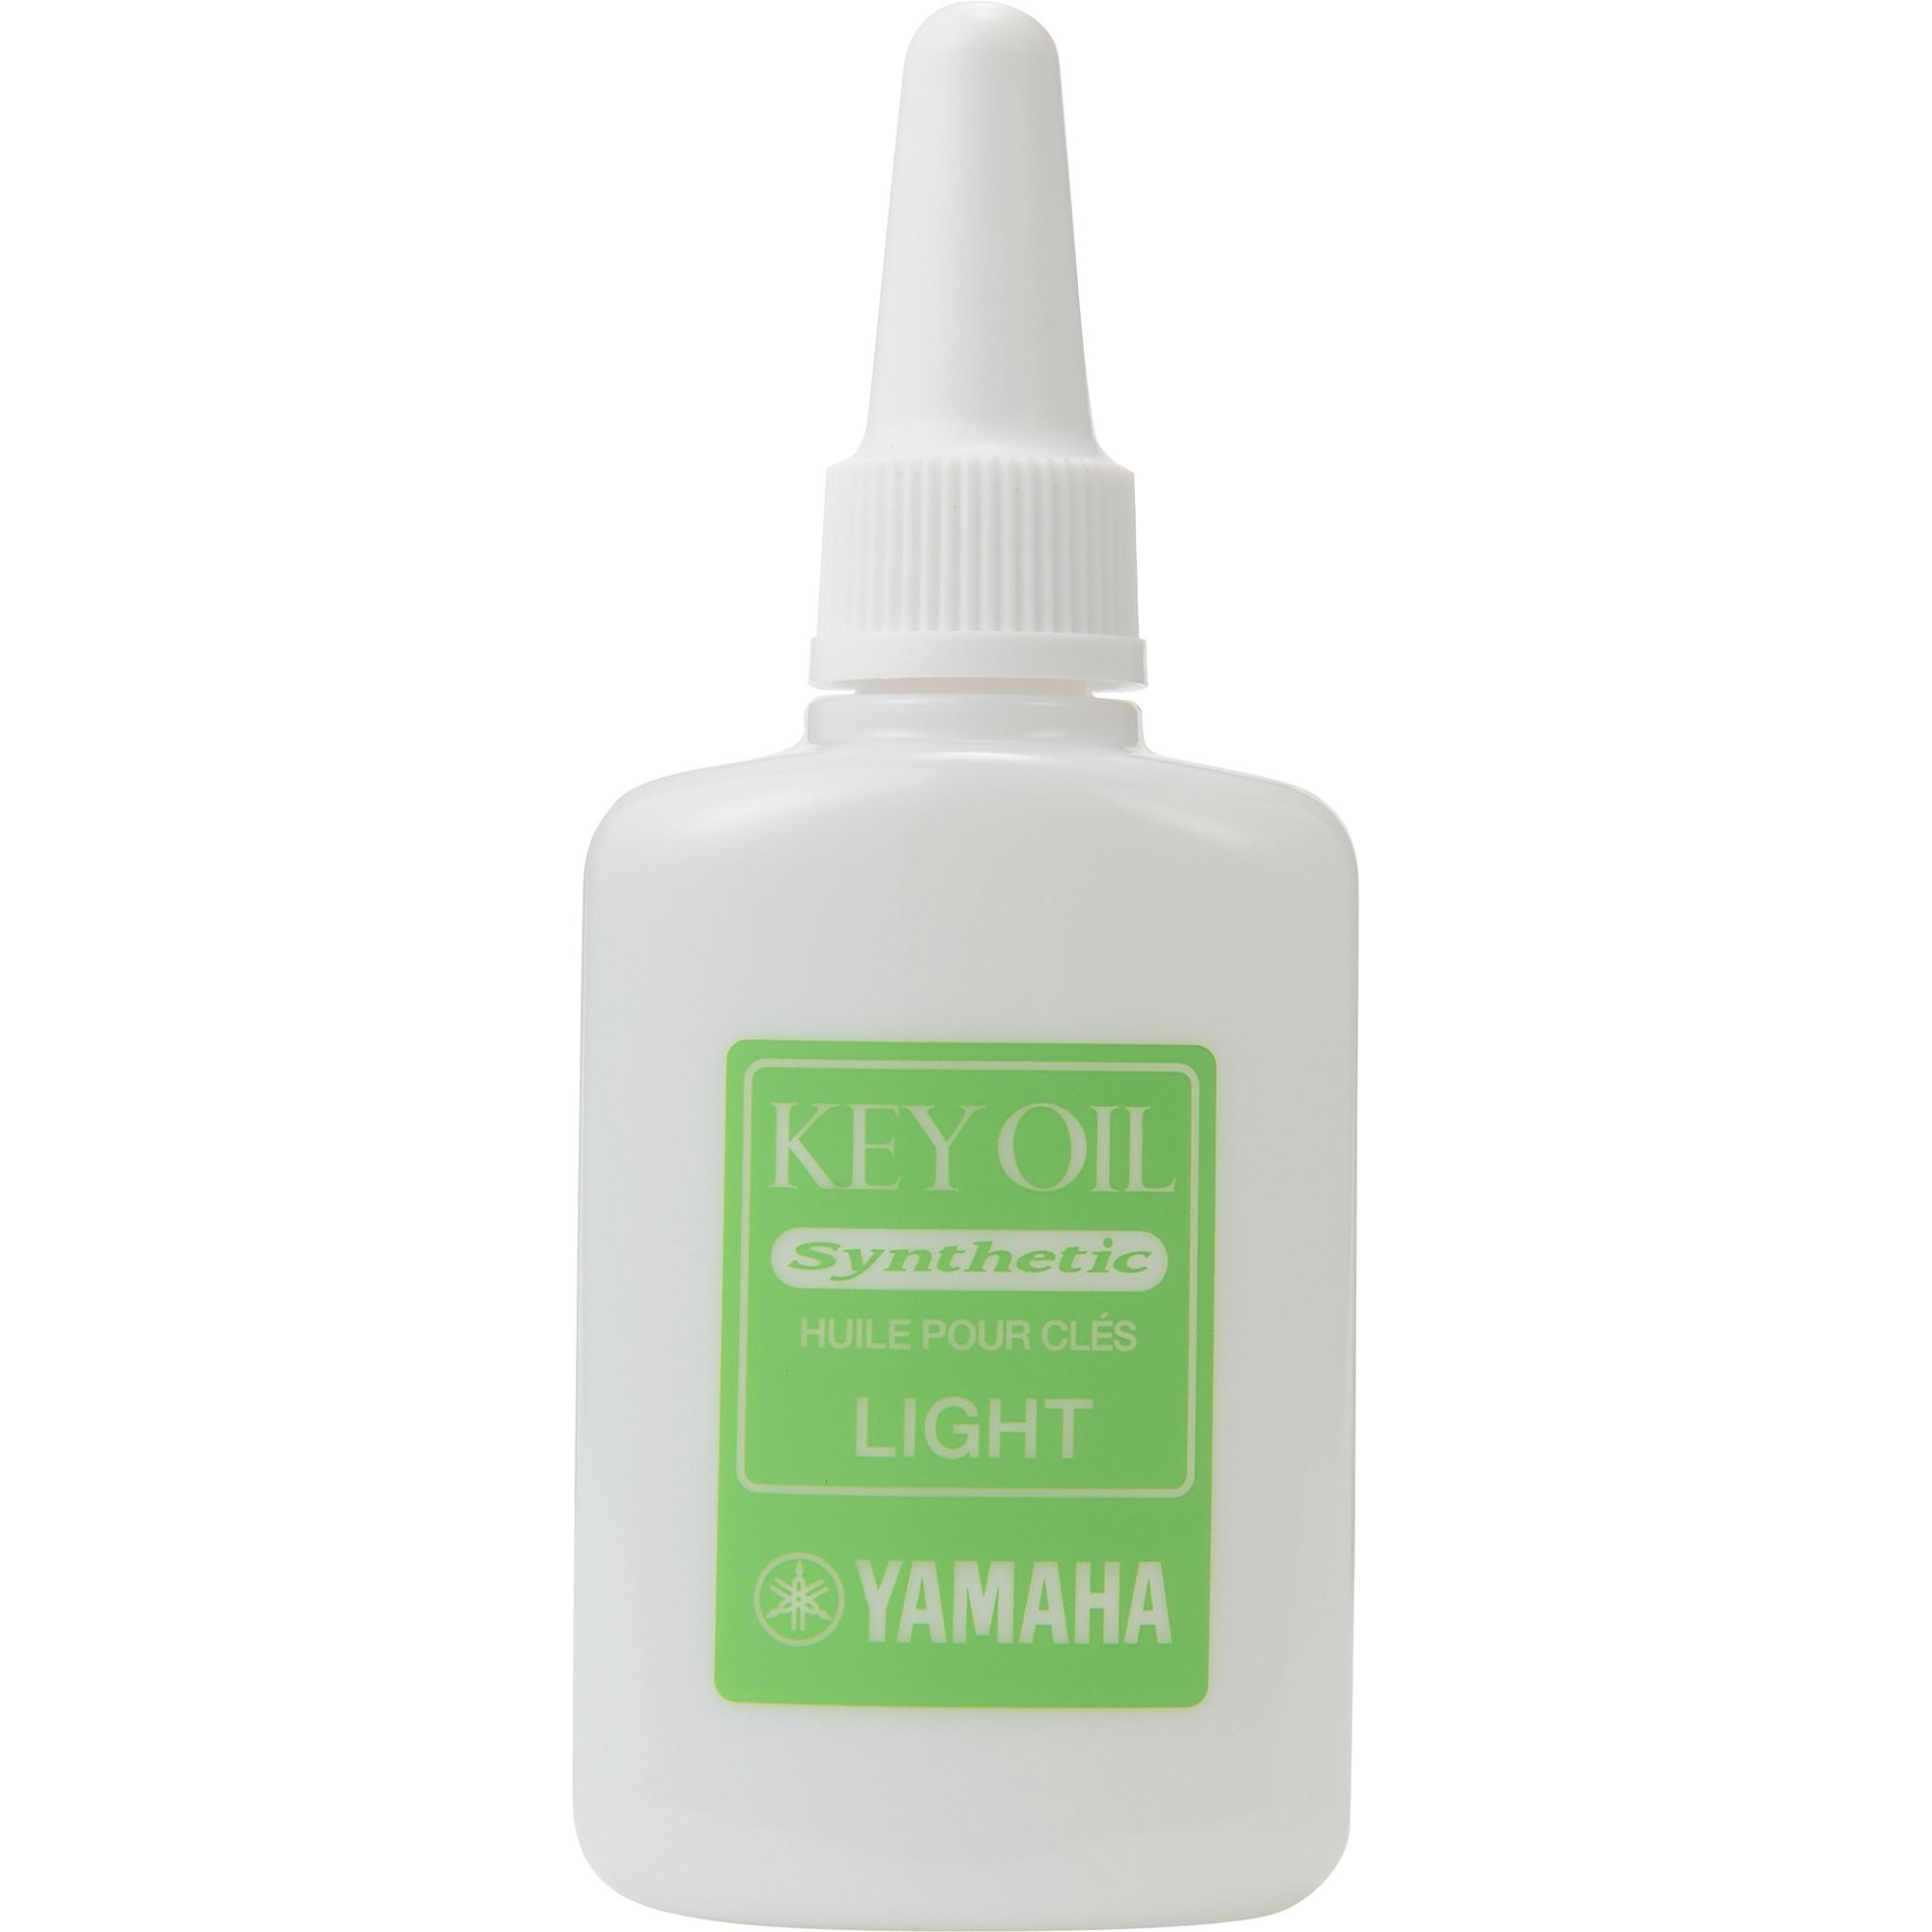 Yamaha YAC LKO Premium Synthetic Light Key Oil